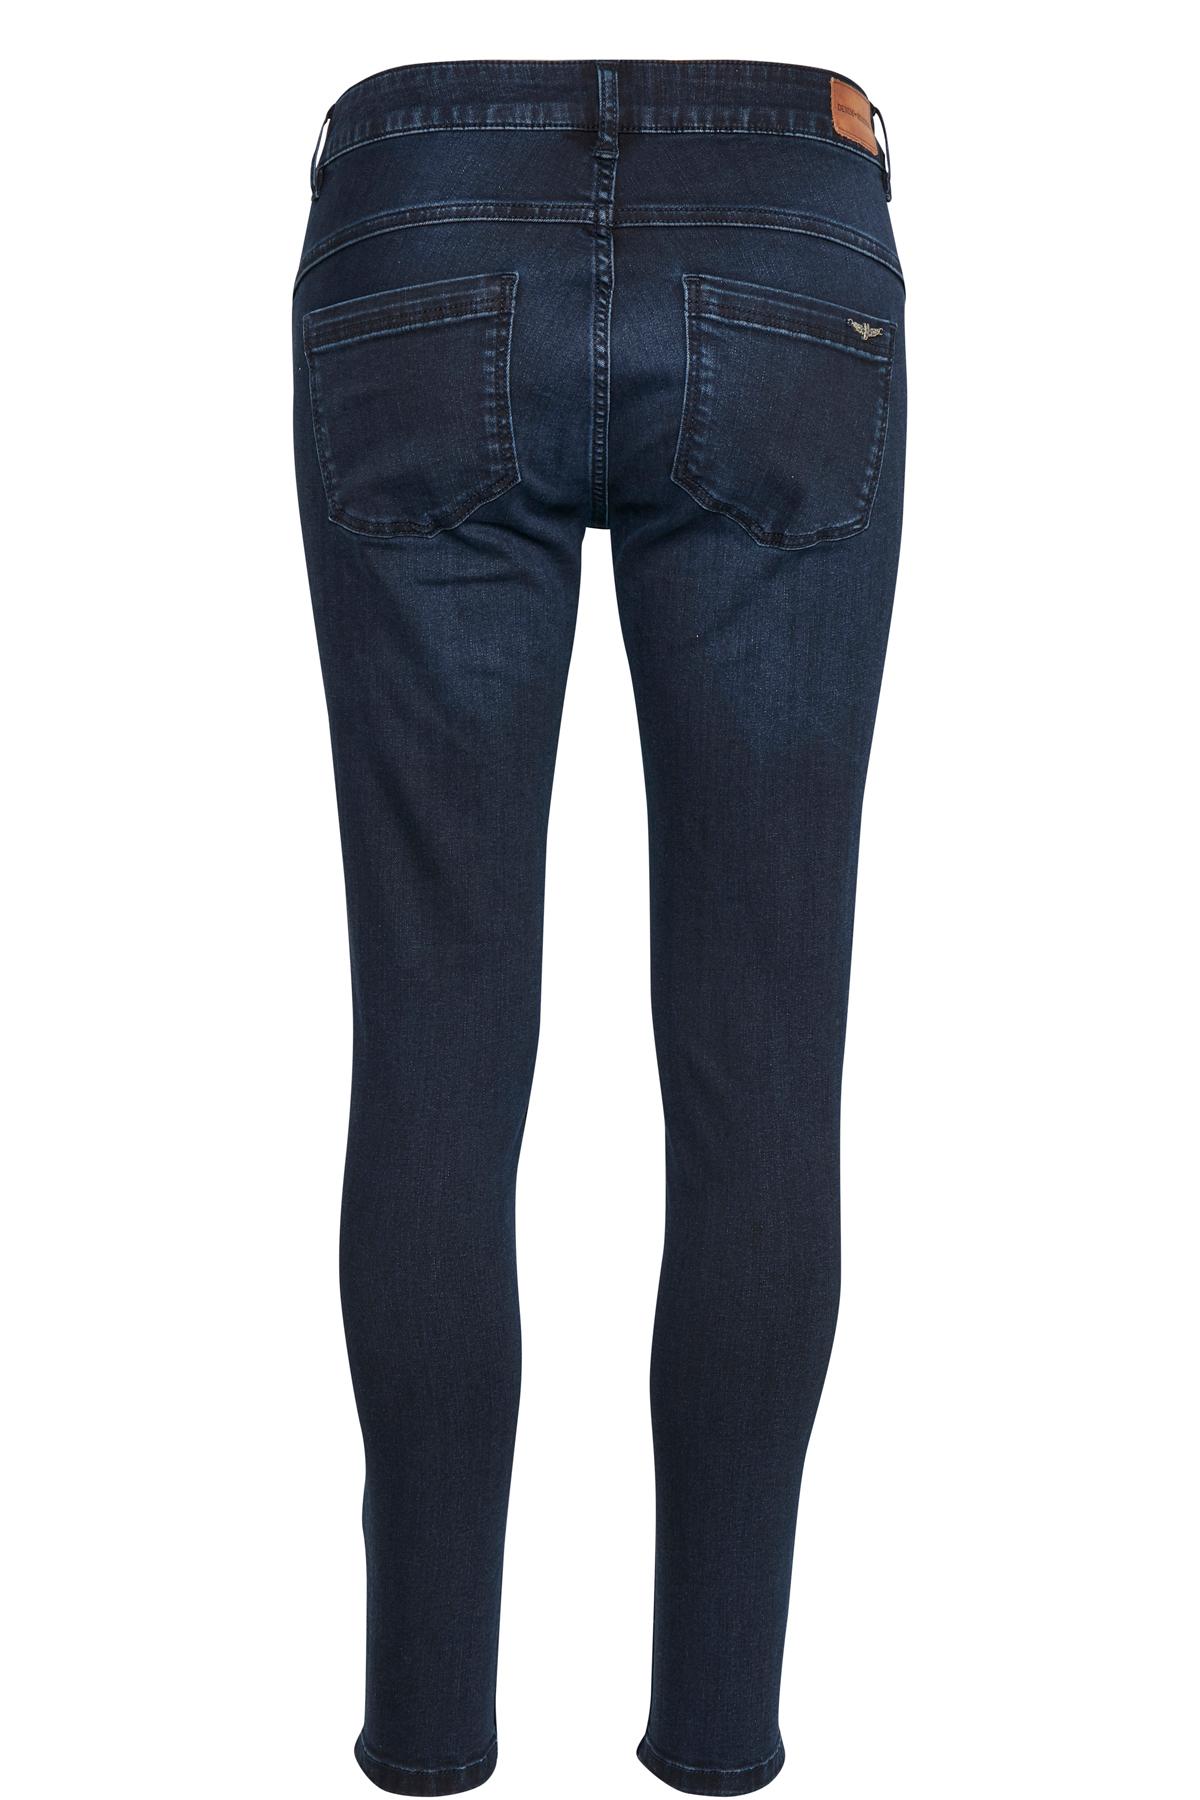 Dunkel denimblau Jeans von Denim Hunter – Shoppen Sie Dunkel denimblau Jeans ab Gr. 24-35 hier